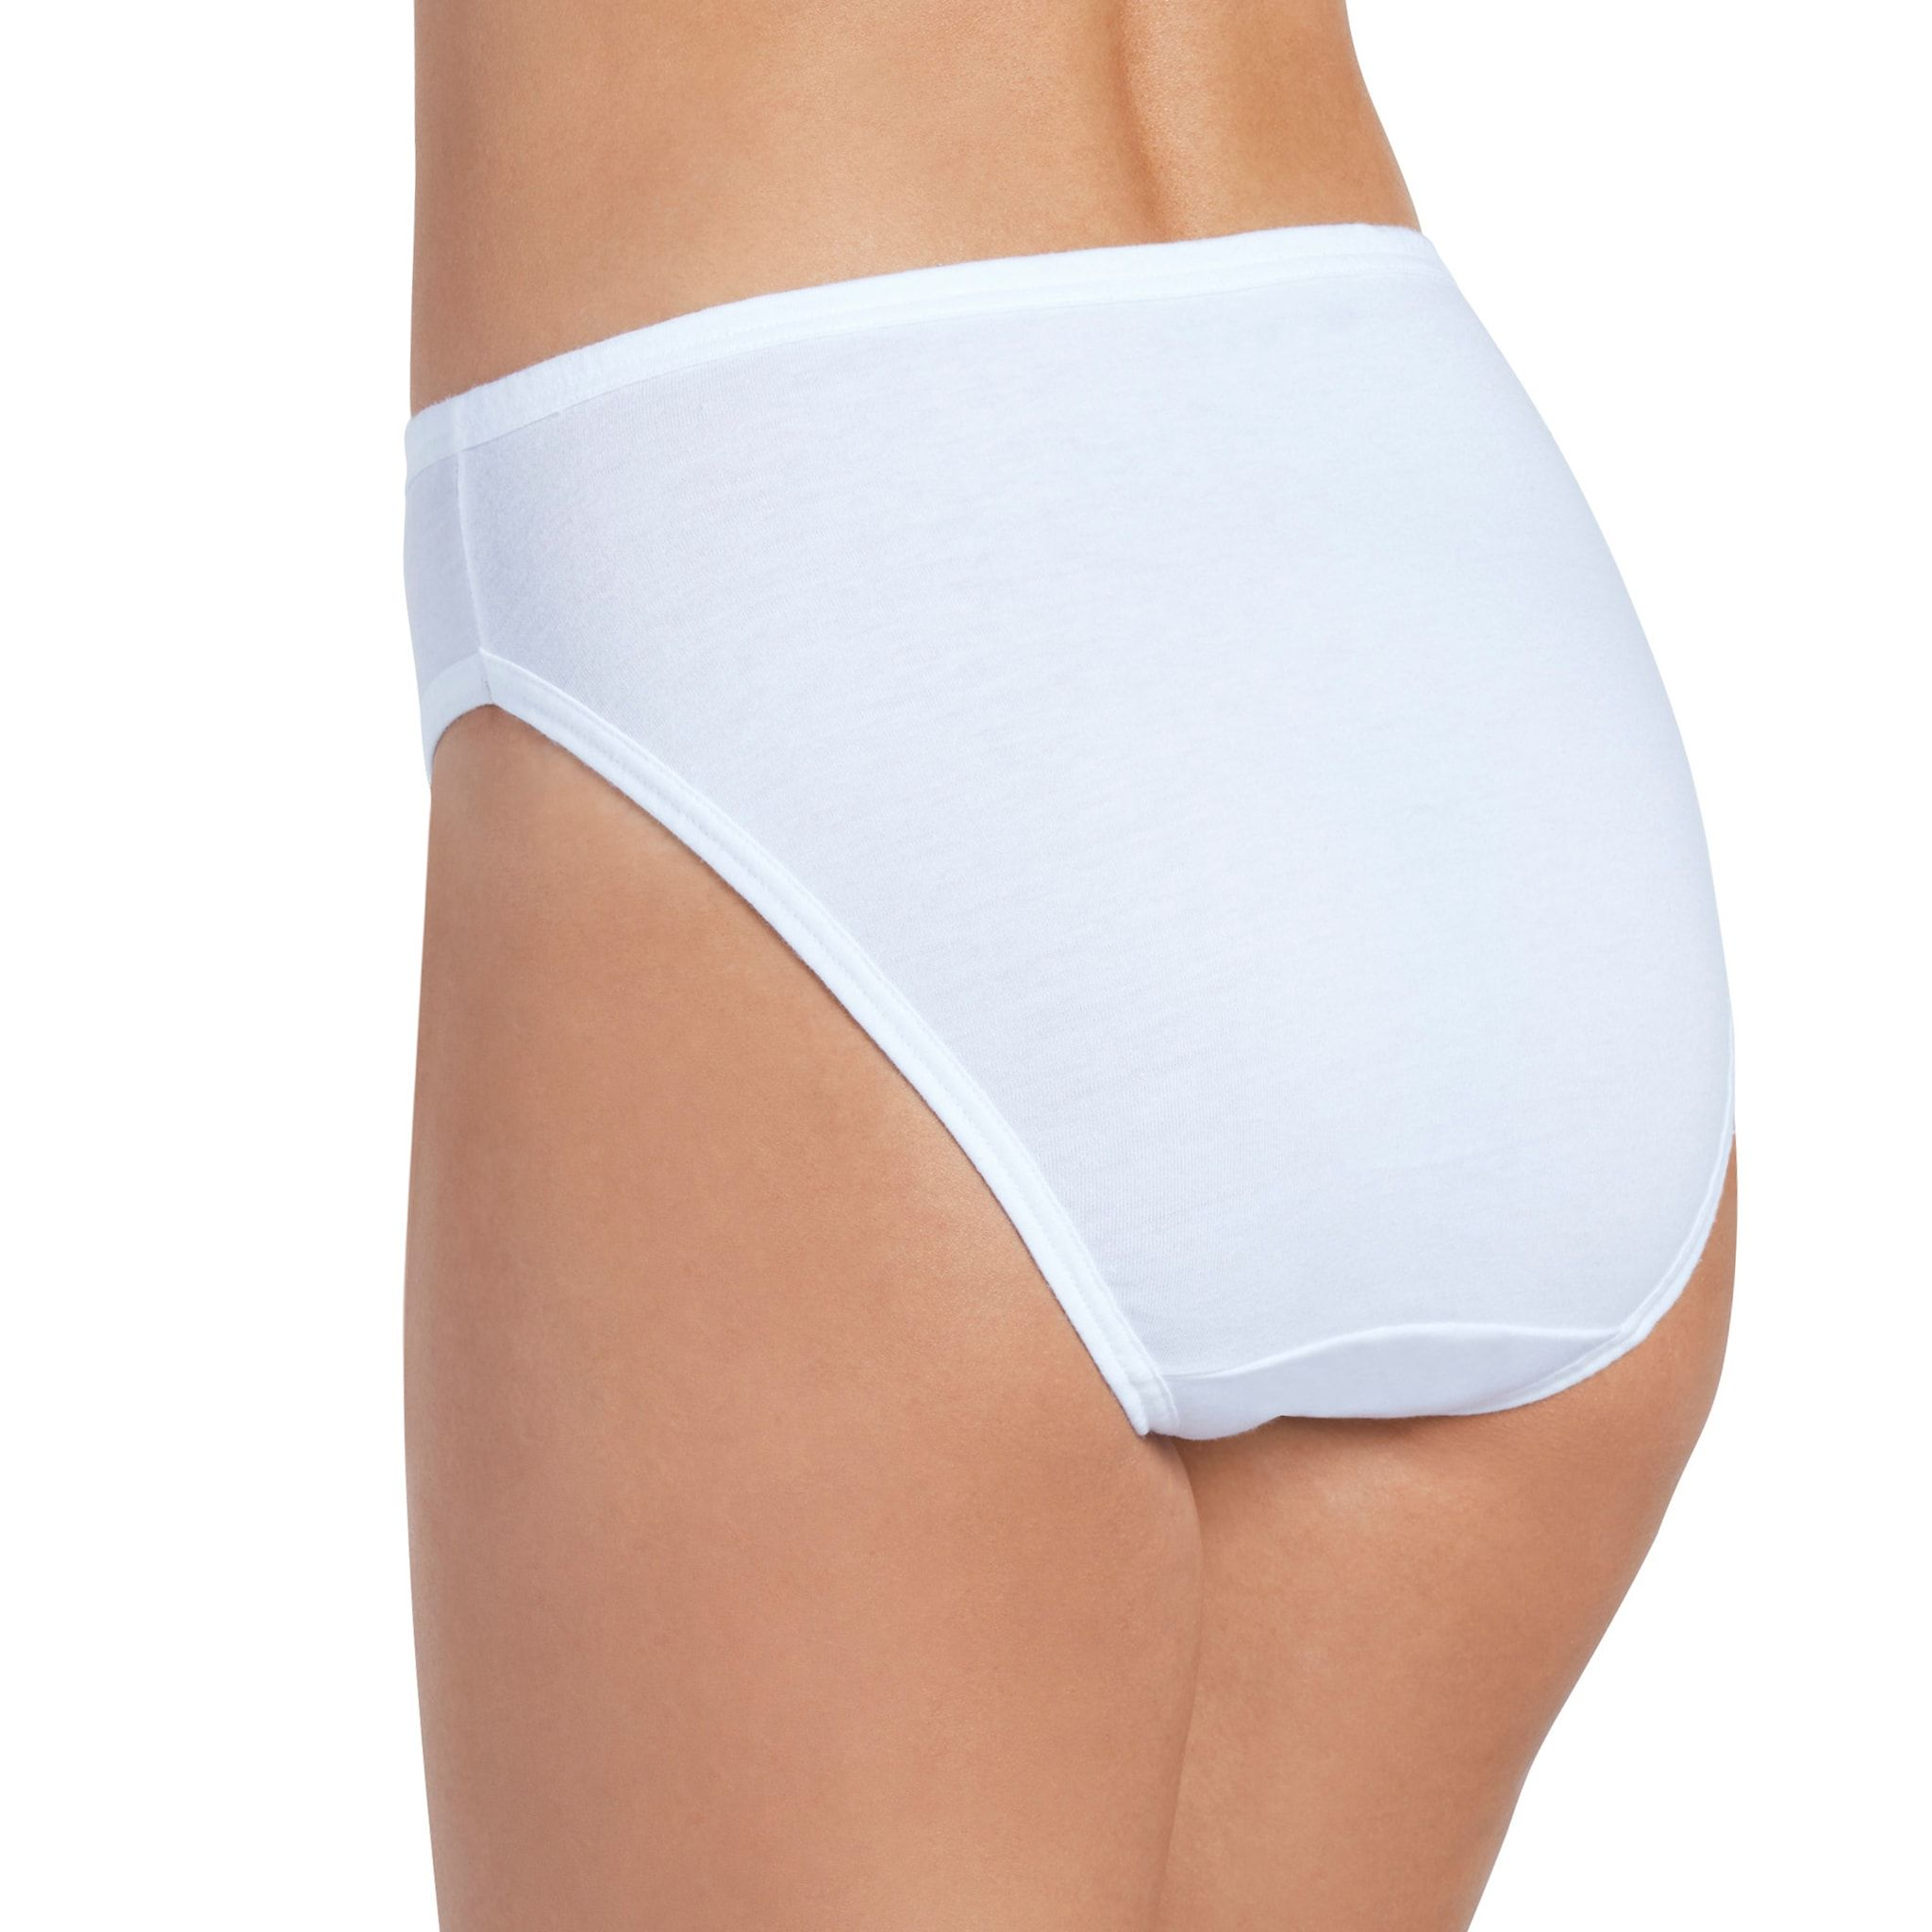 751a4eec600 Plus Size Jockey Elance 3-pk. French Cut Panties 1485  Elance